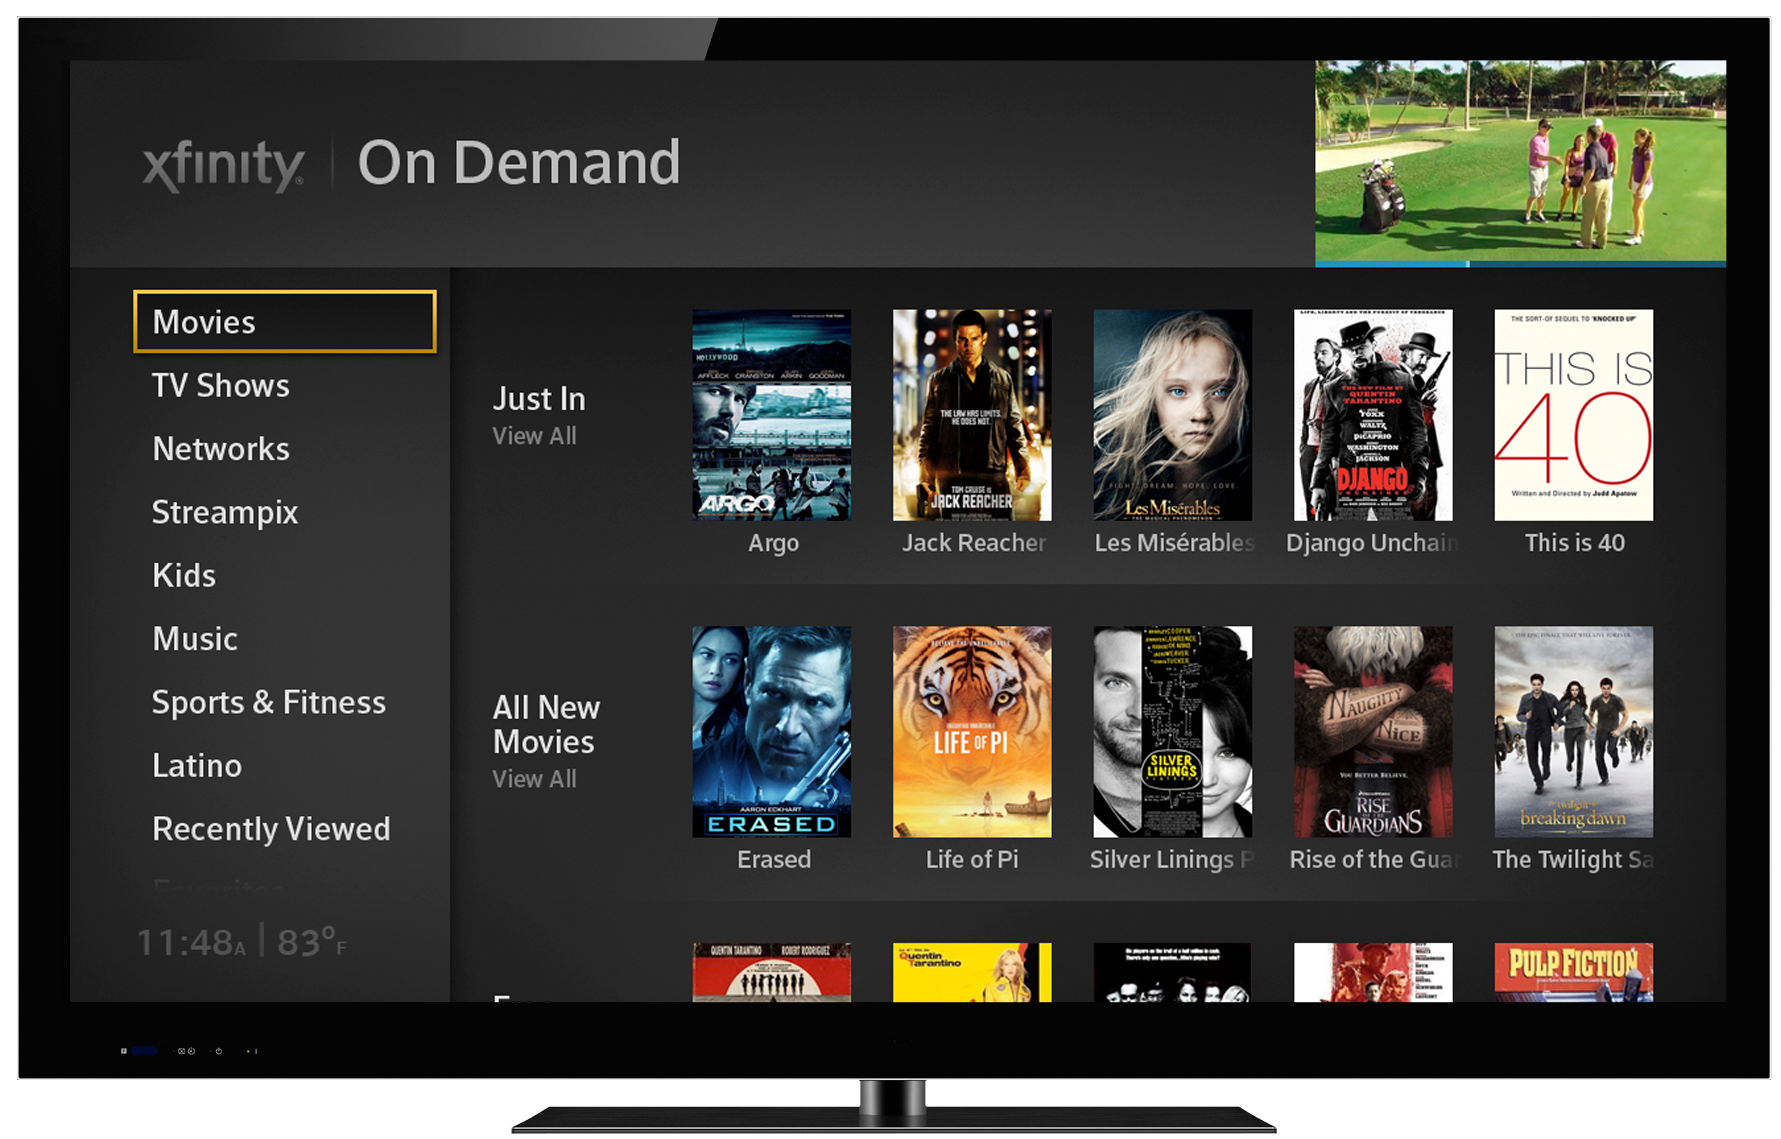 Comcast Launches x1 Platform for Xfinity in Illinois, Northwest ...